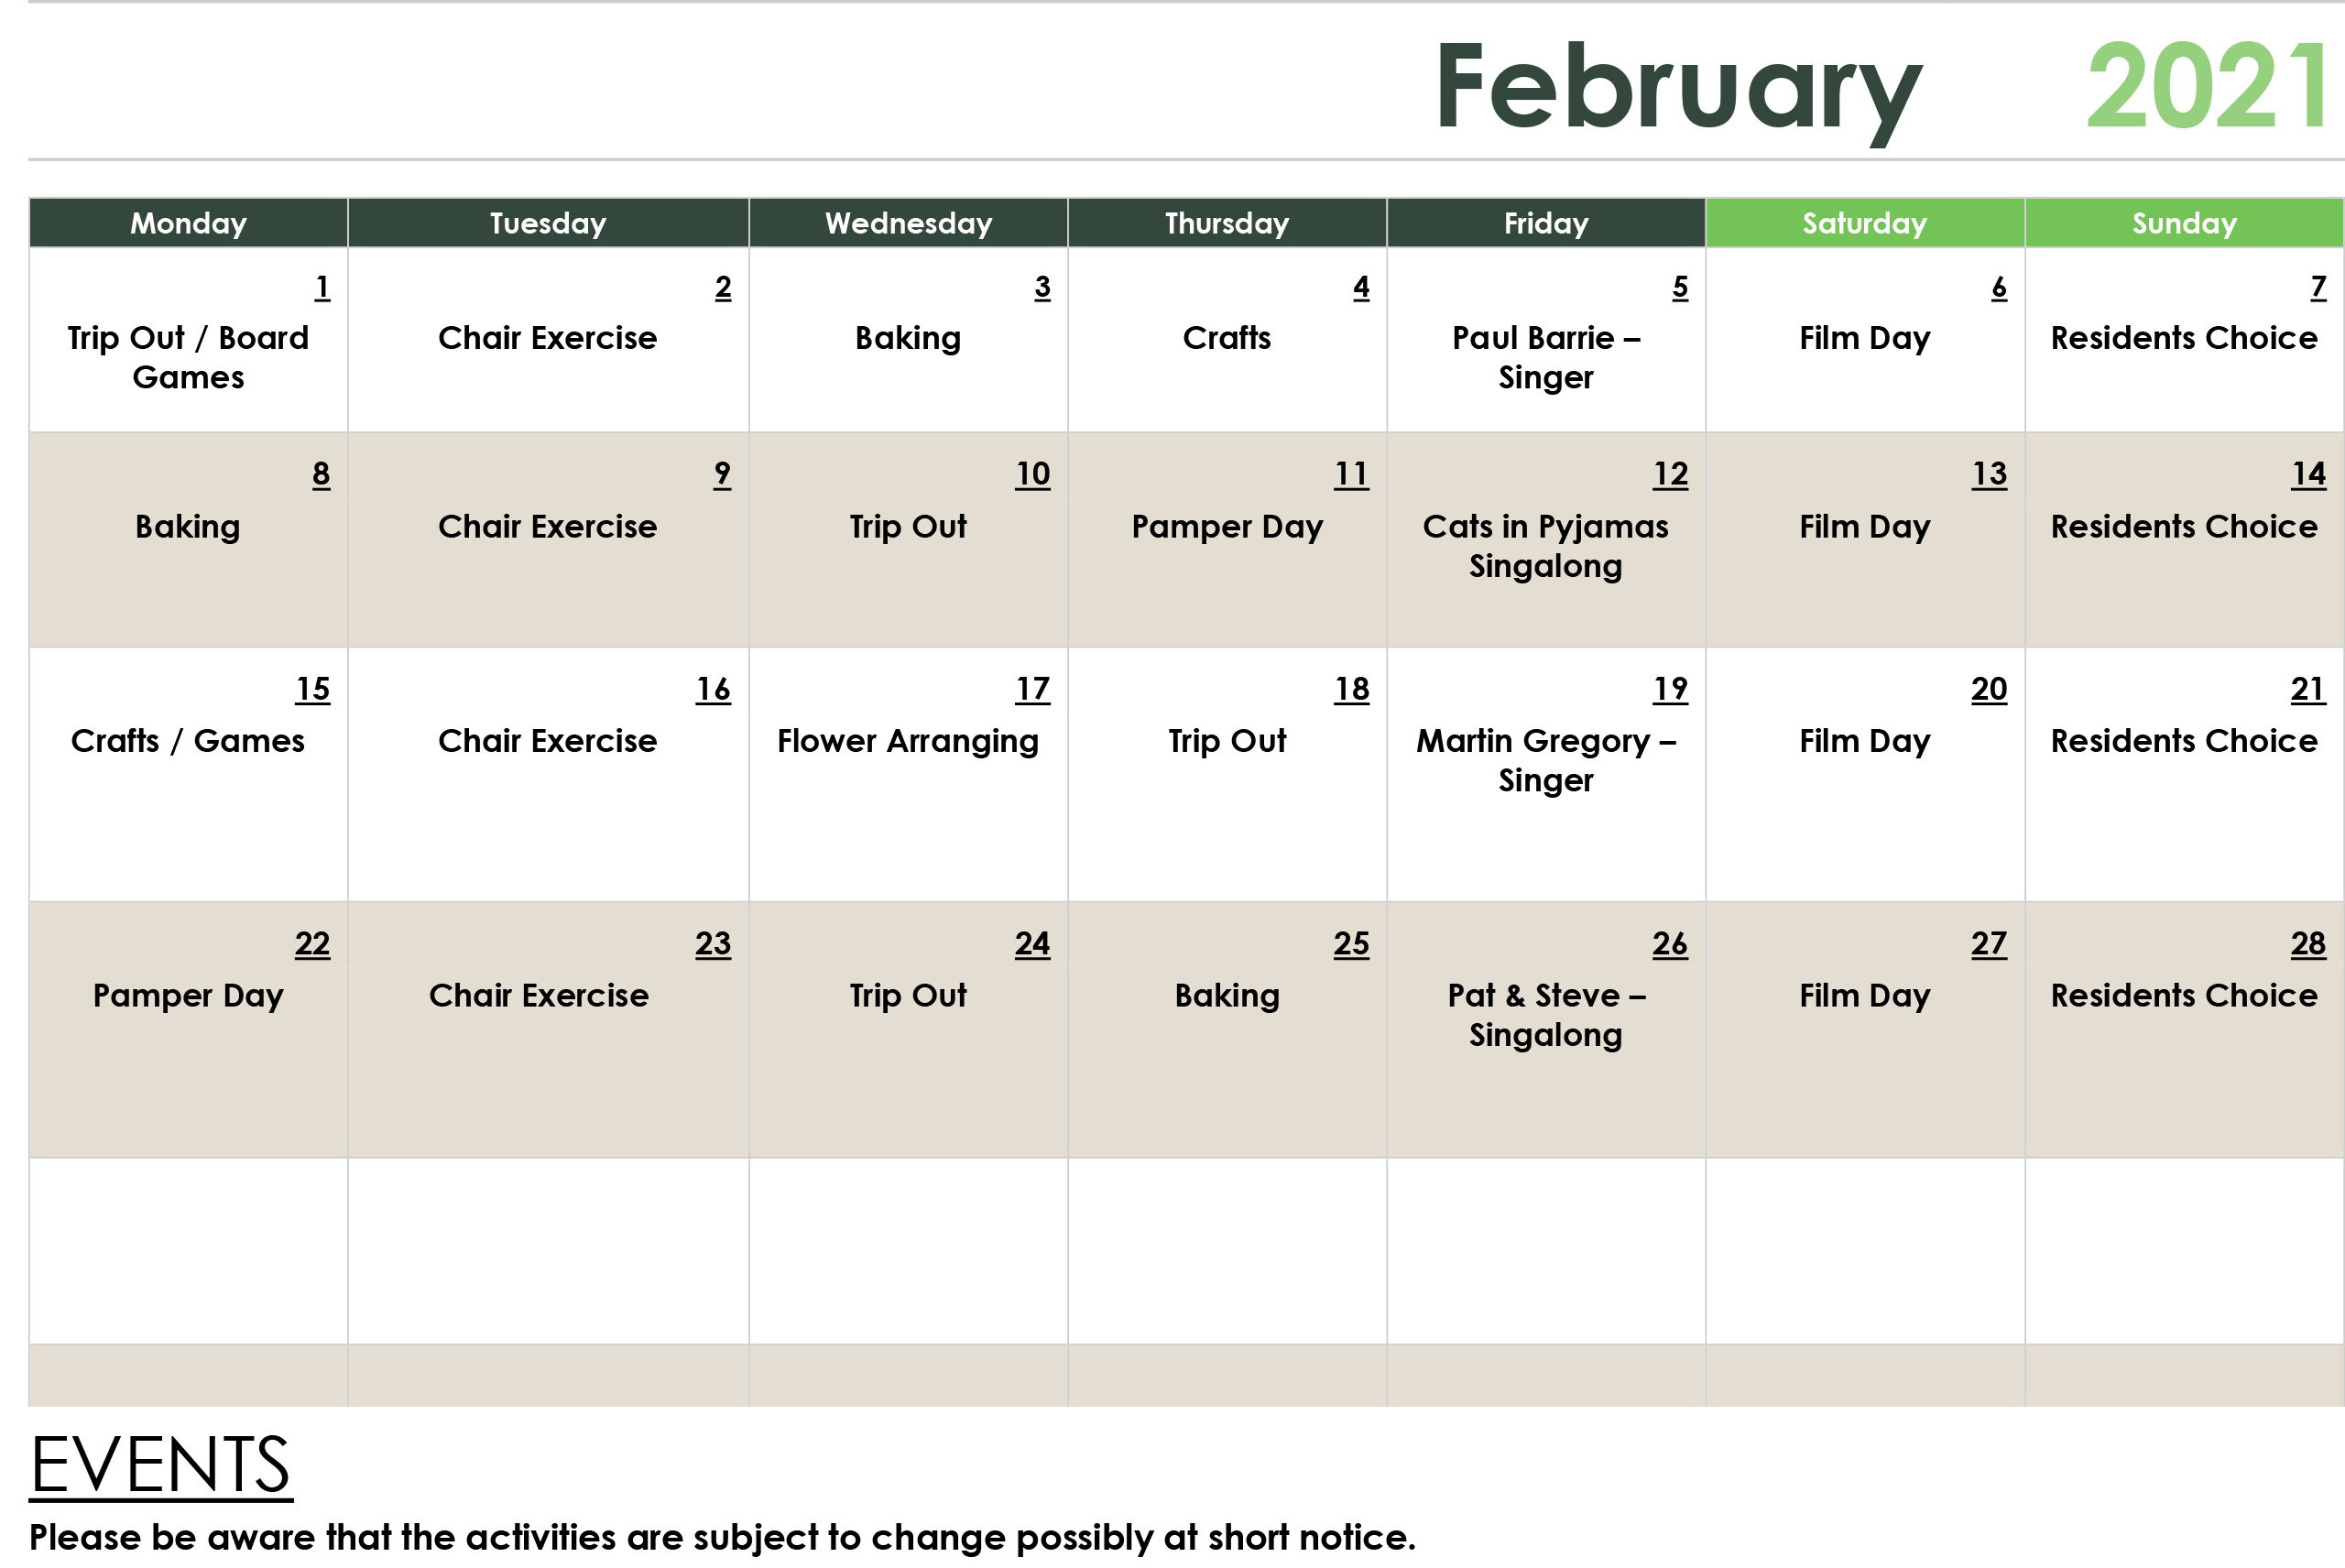 February Activity Calendar 2021